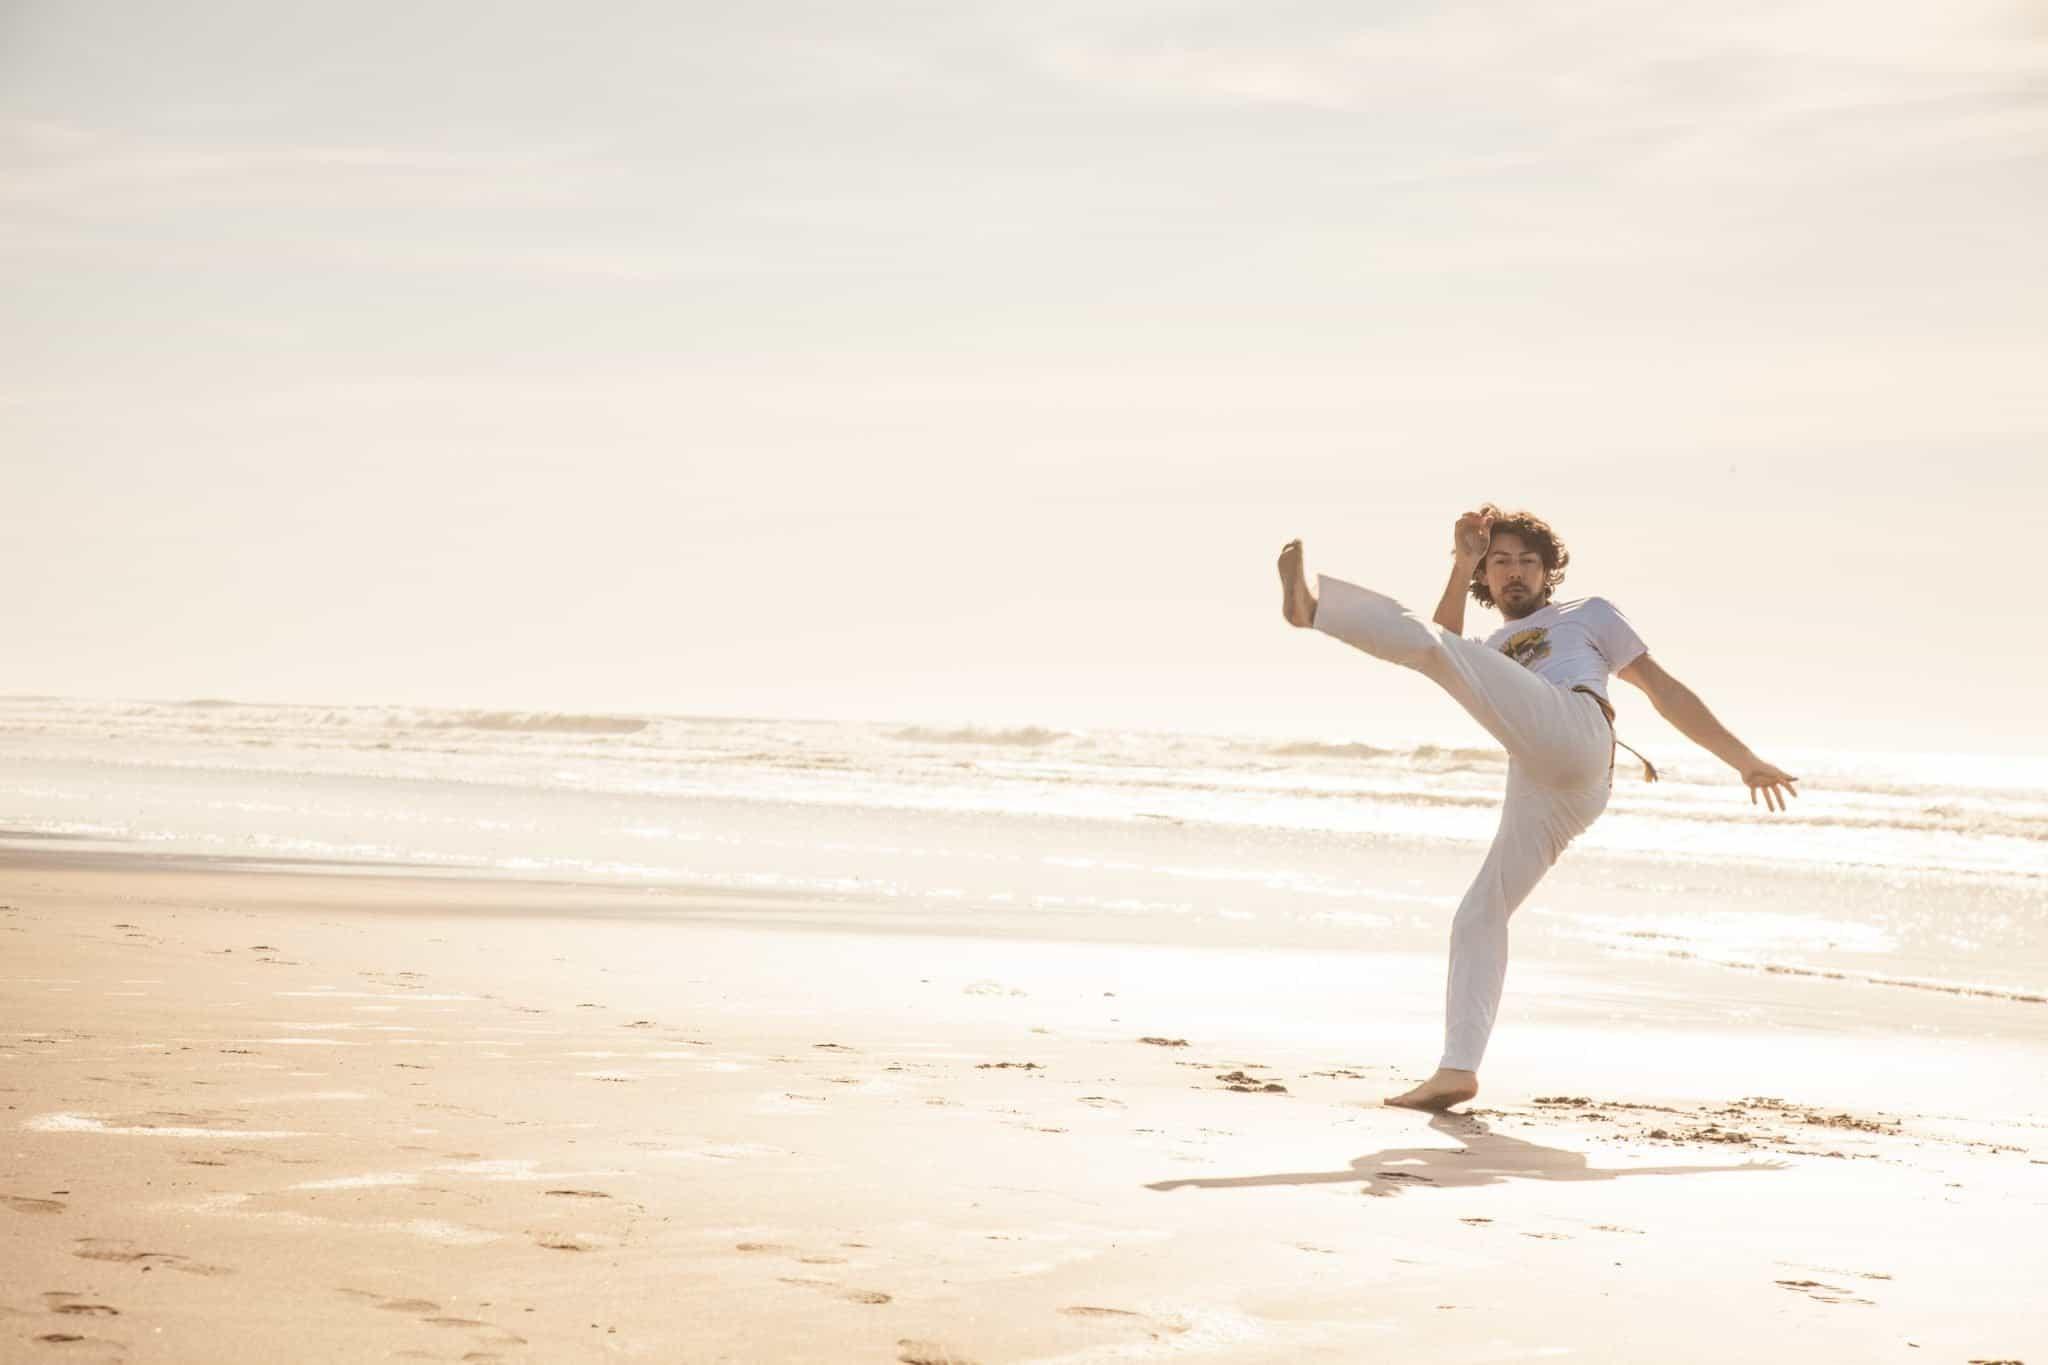 capoeira classes, capoeira new me, learn capoeira, capoeira school, capoeira, dende arts, movement class, movement culture, Capoeira kicks, capoeira movements, flexibility, mobility, capoeira in new jersey, capoeira in jersey city, Jersey city capoeira, cordao de ouro, cdo, cordao de ouro new jersey